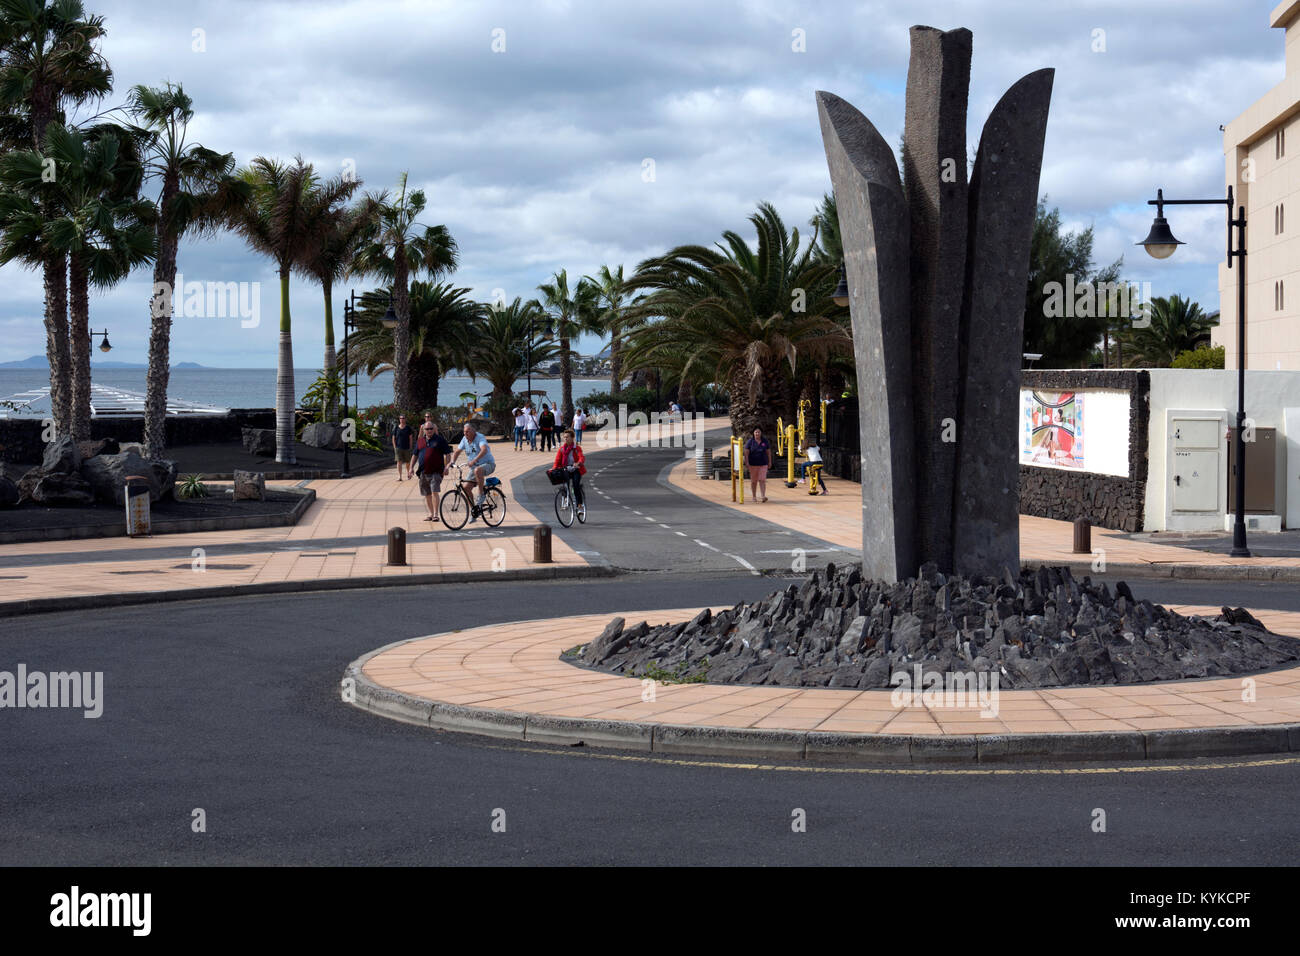 Playa Matagorda, Lanzarote, Kanarische Inseln, Spanien. Stockbild